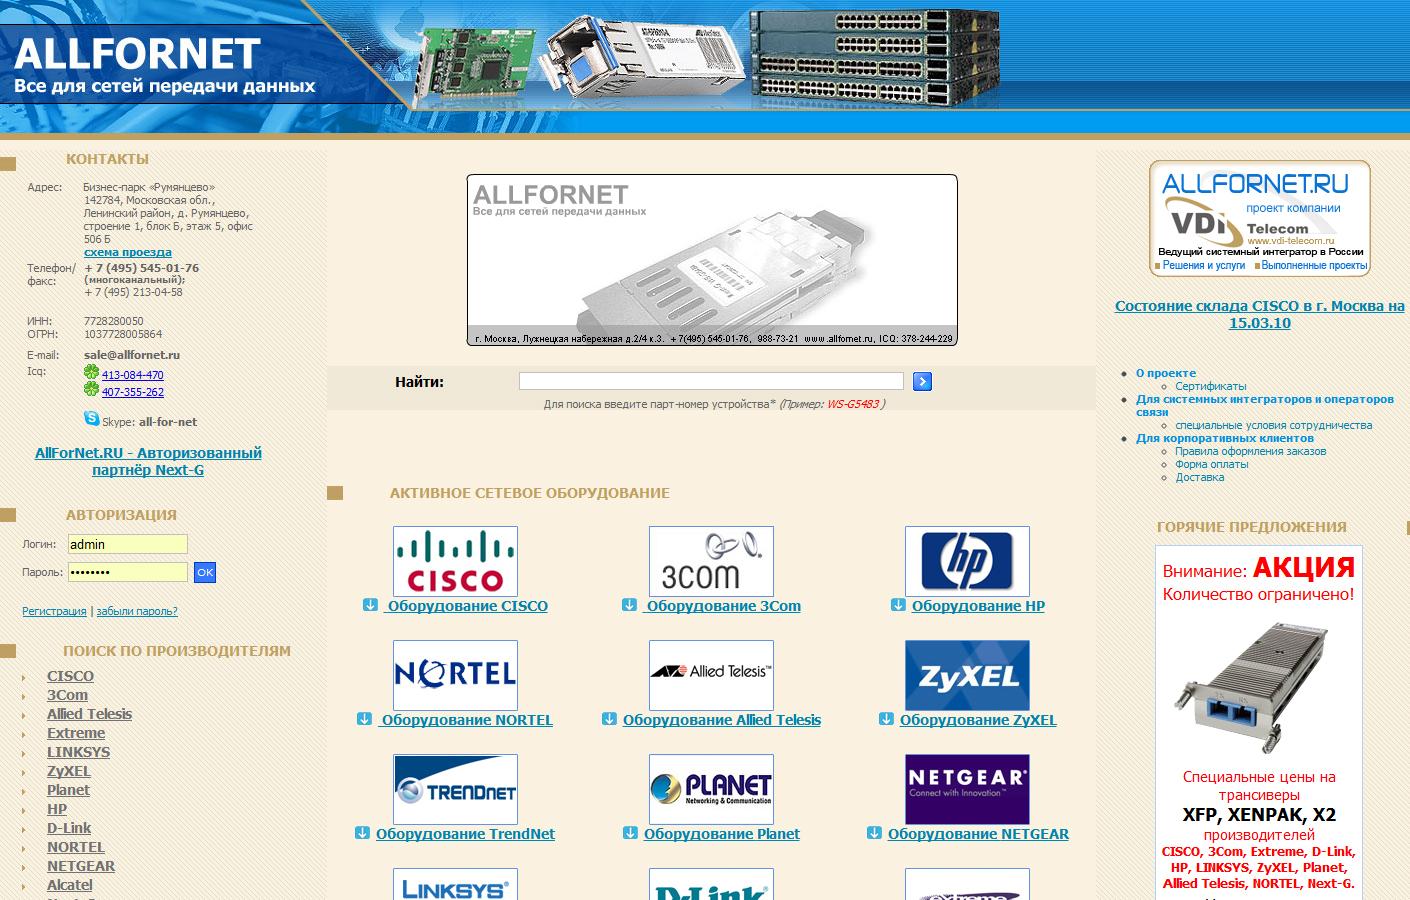 Сайт компании ВДИ-Телеком